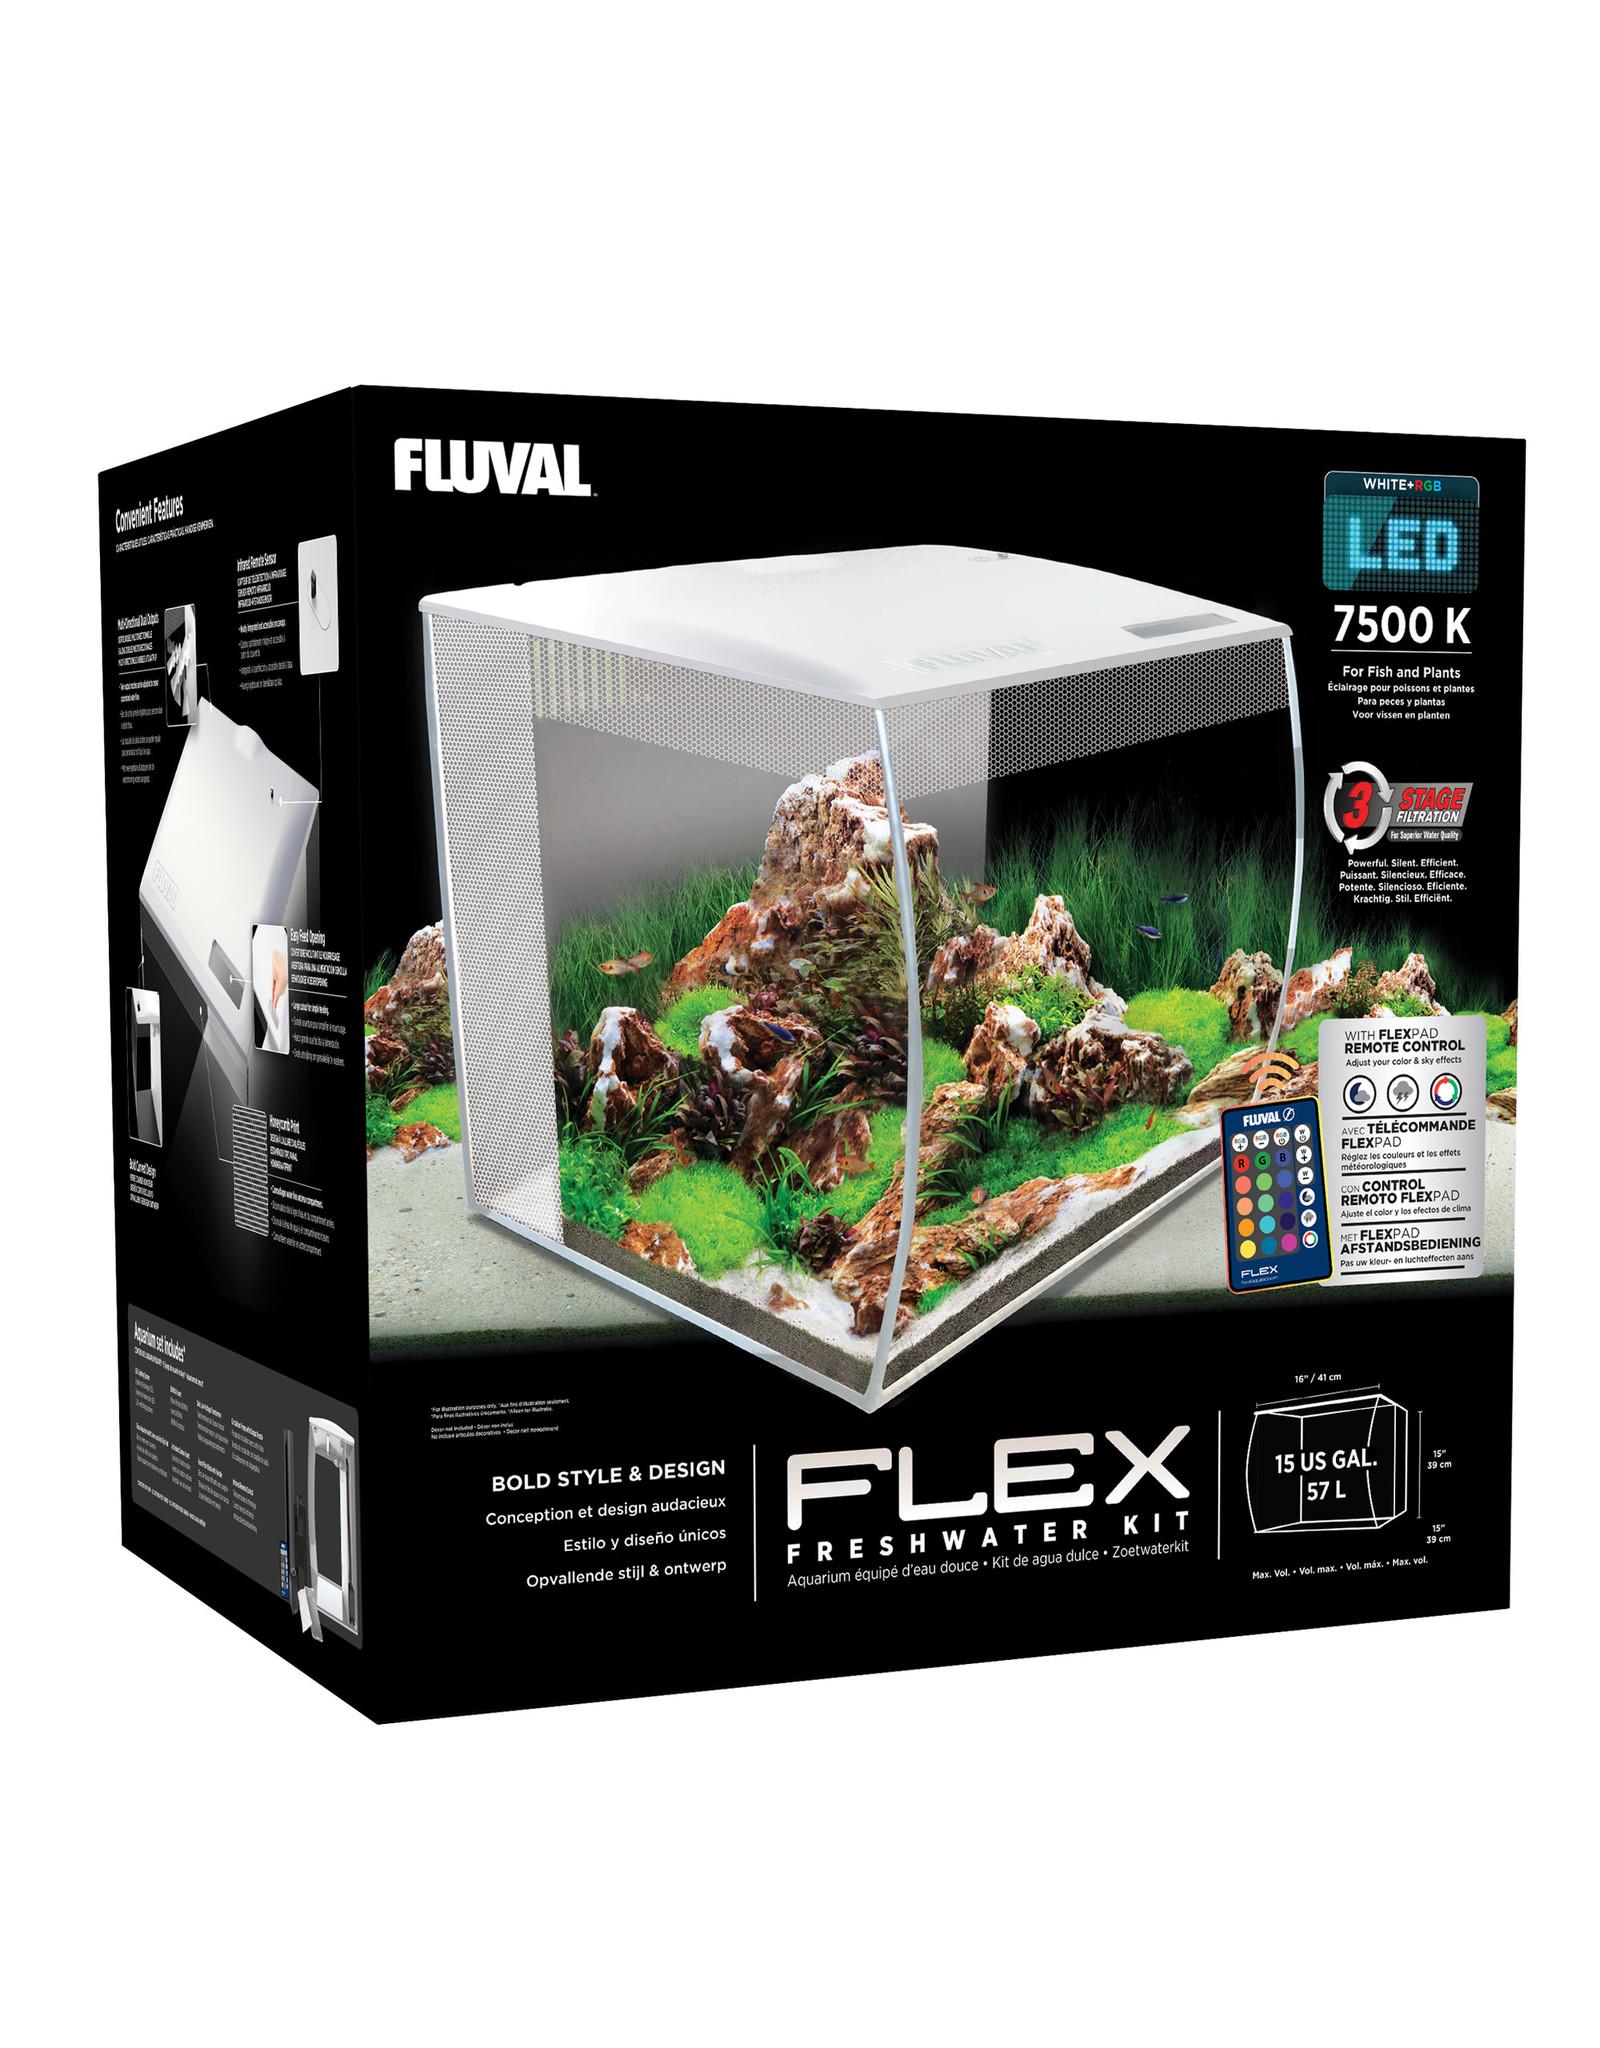 Fluval Fluval Flex Aquarium Kit - 57 L (15 US gal) - White